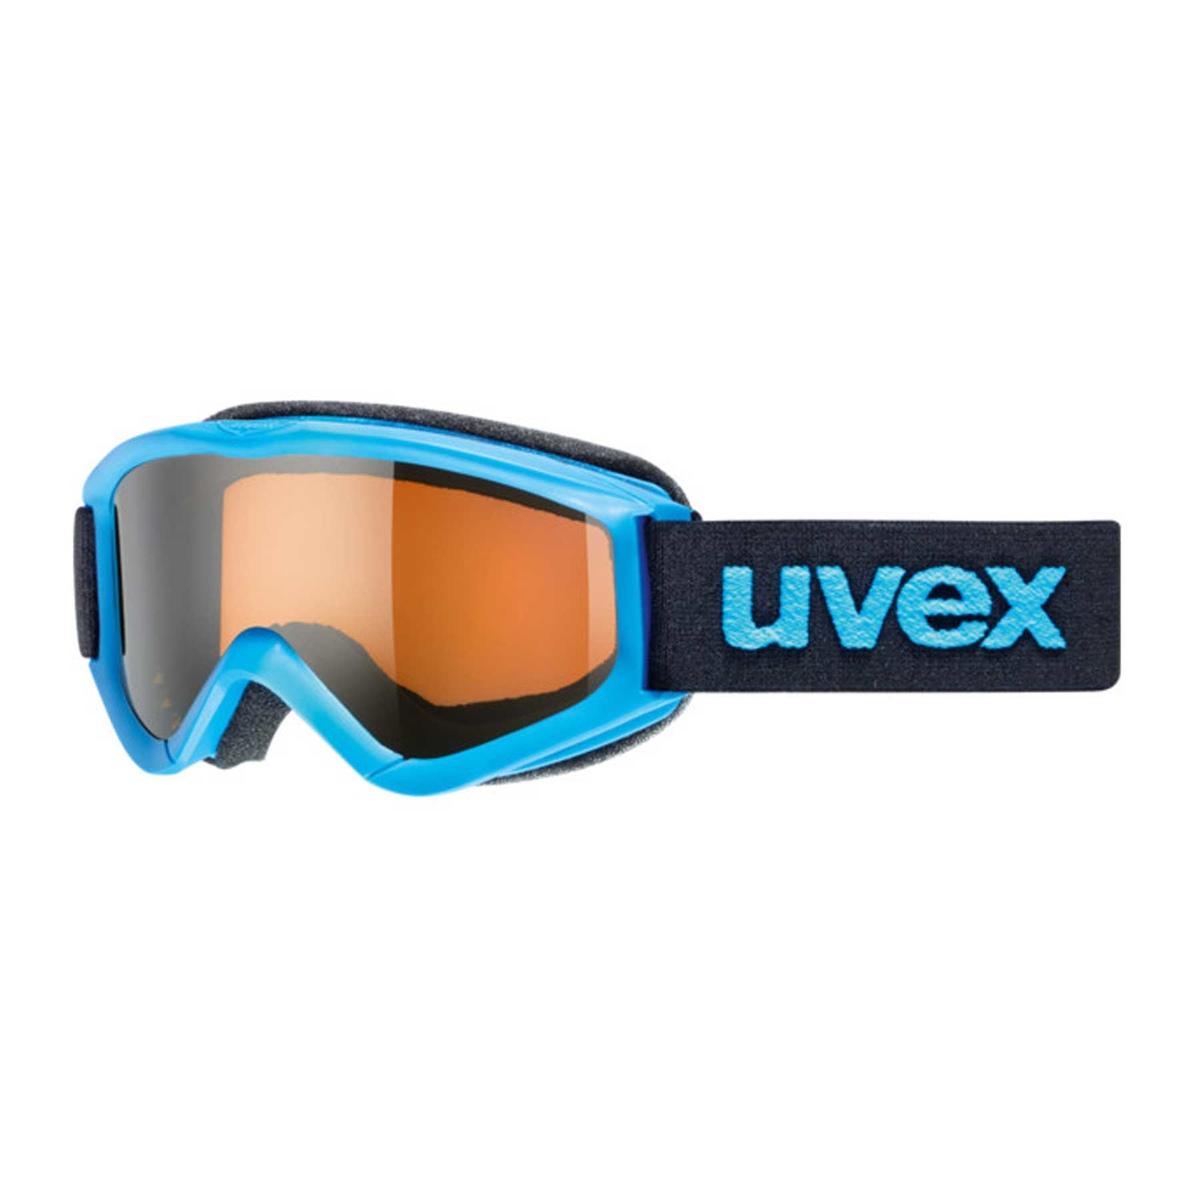 Prezzi Uvex maschera speedy pro s2 bambino